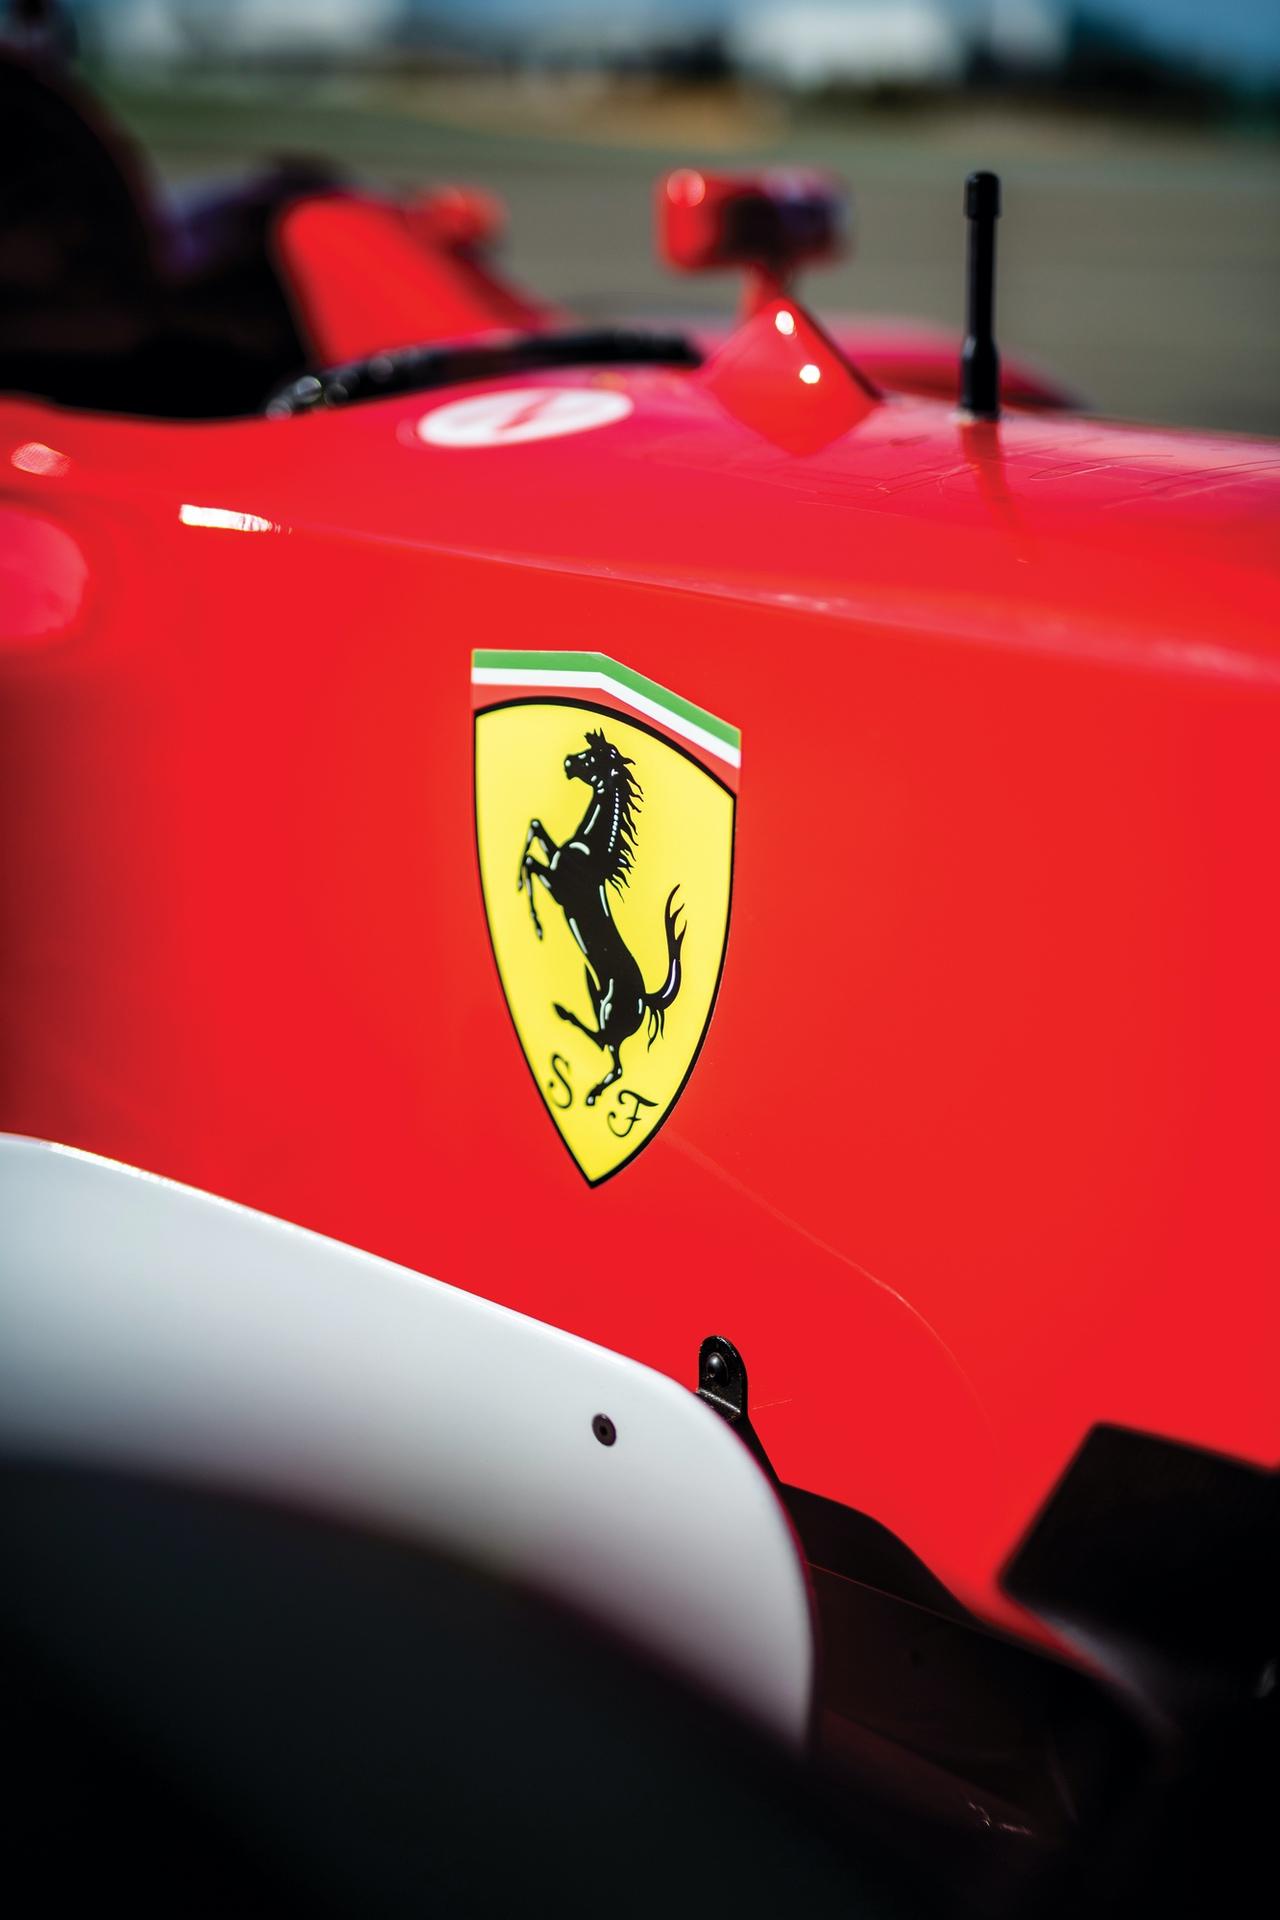 Mick_Schumacher_Ferrari_F2002_0038